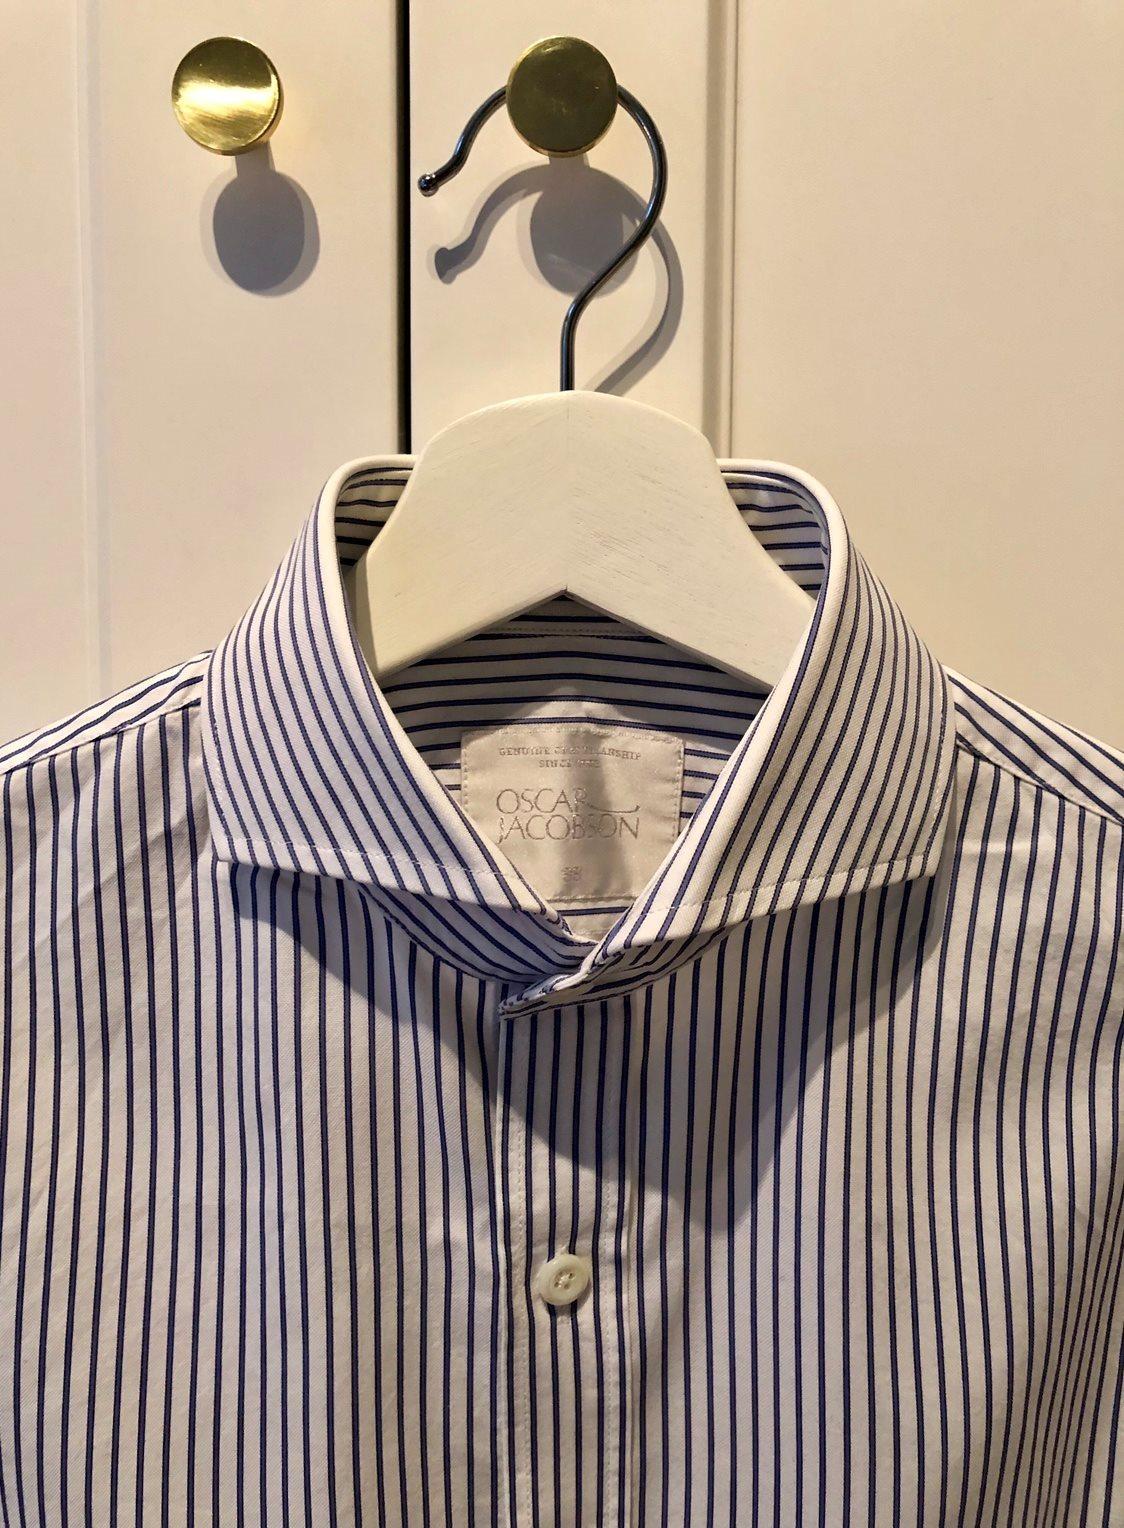 Skjortor Oscar Jacobson storlek 38 (336891697) ᐈ Köp på Tradera 68a05150a17c4